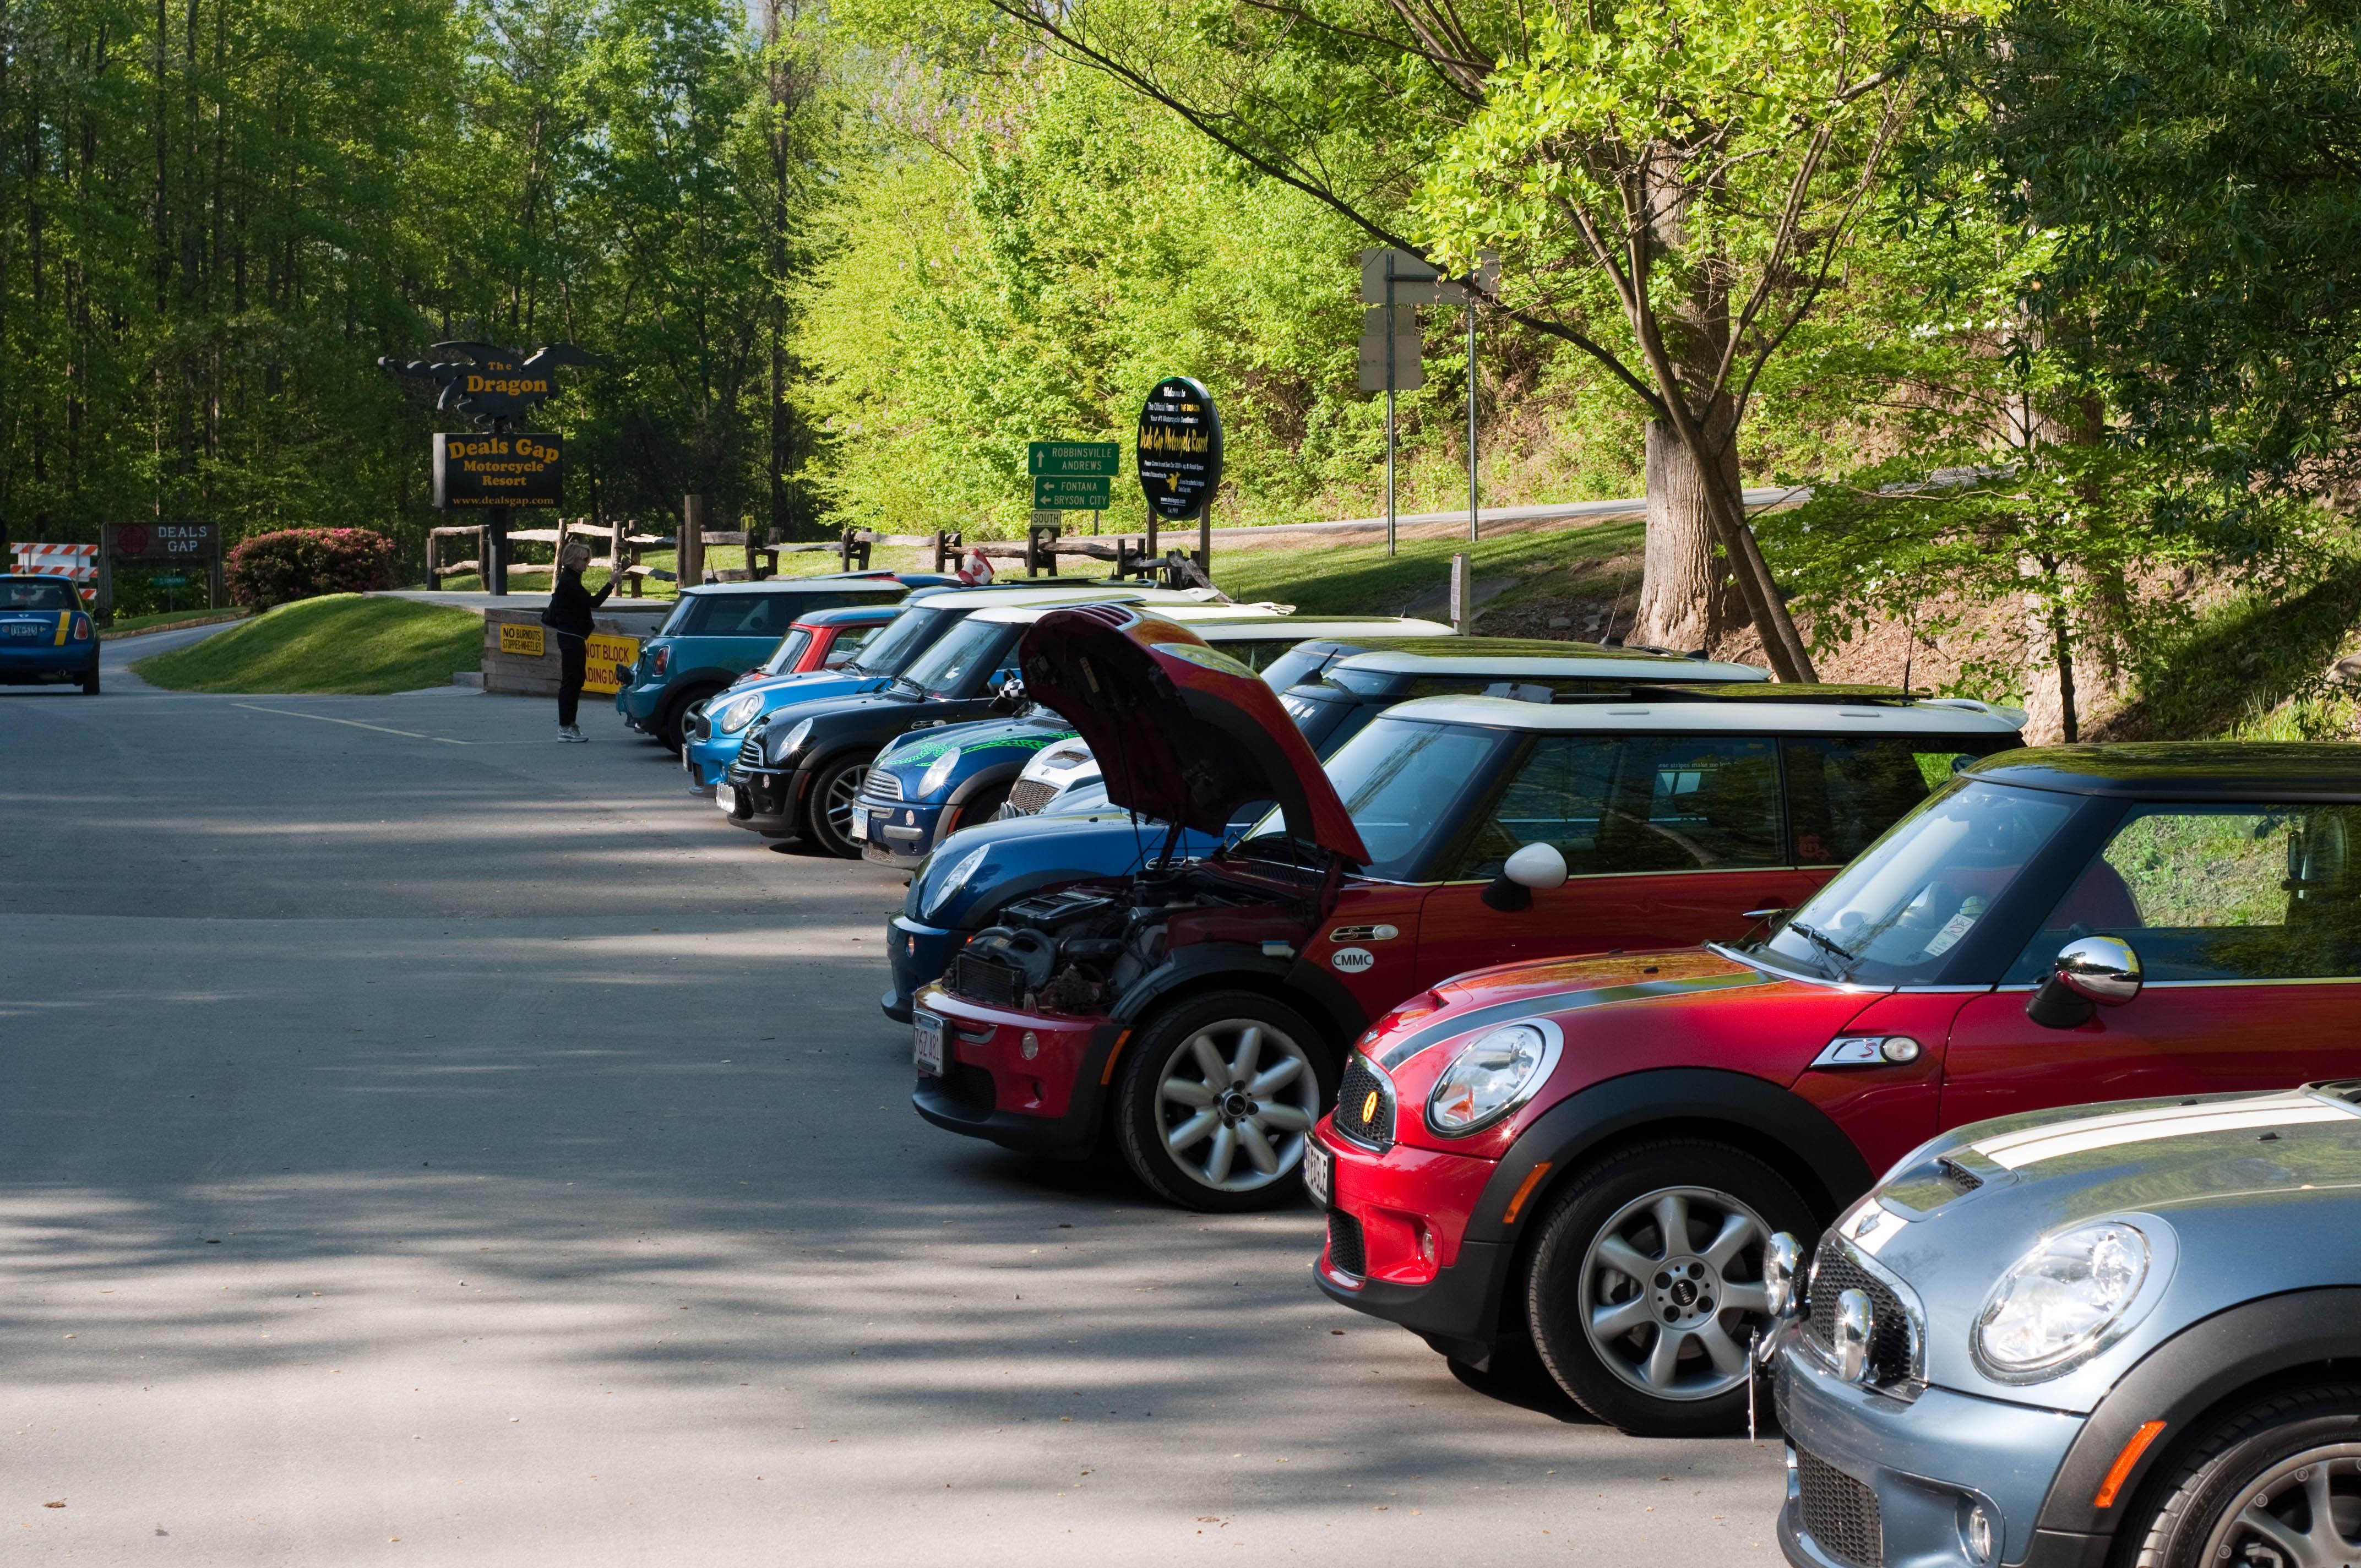 File Bmw Minis In Parking Lot Of Deals Gap Resort Jpg